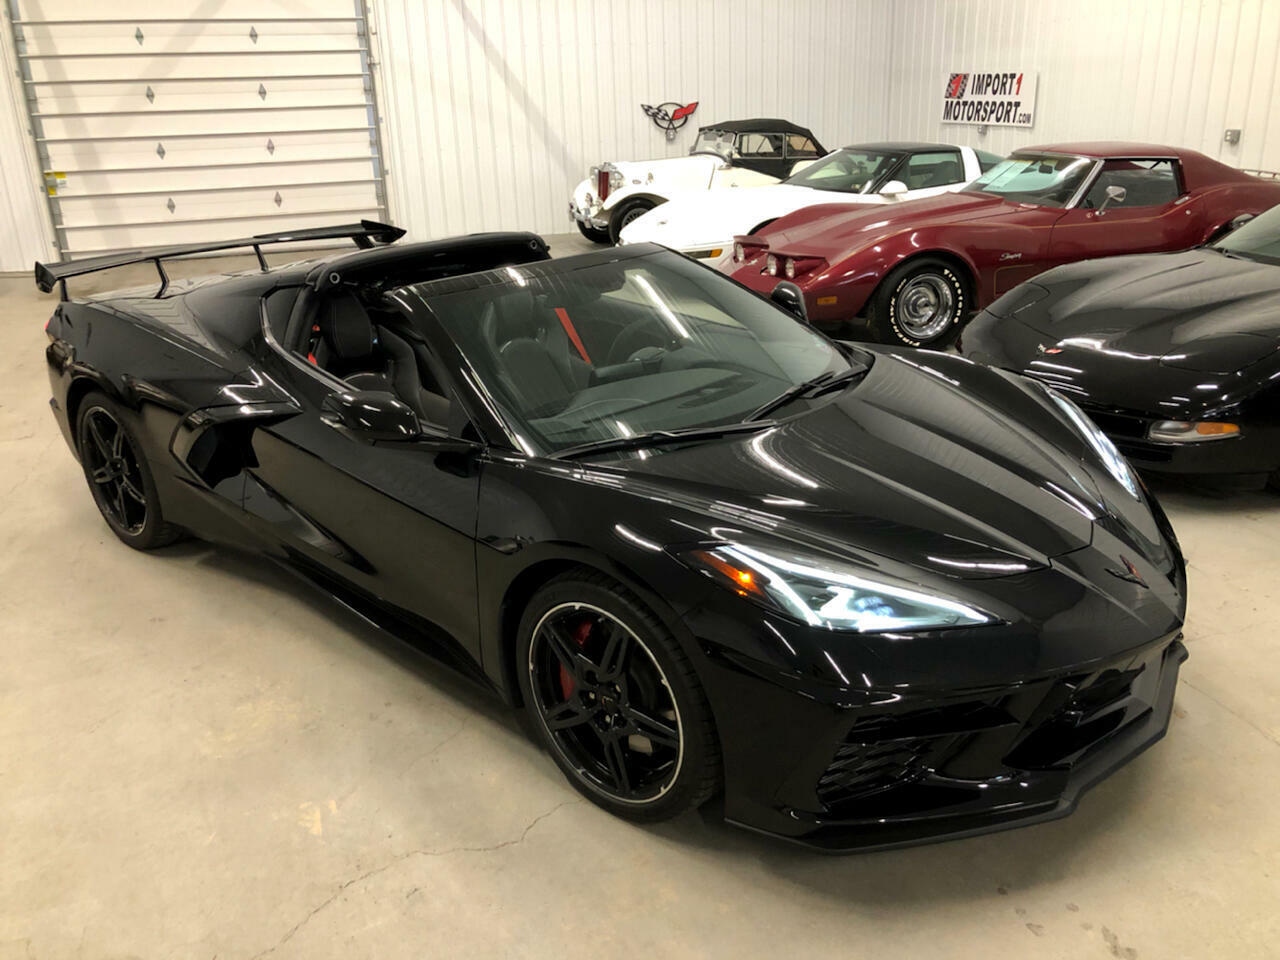 2020 Black Chevrolet Corvette Coupe 1LT | C7 Corvette Photo 2